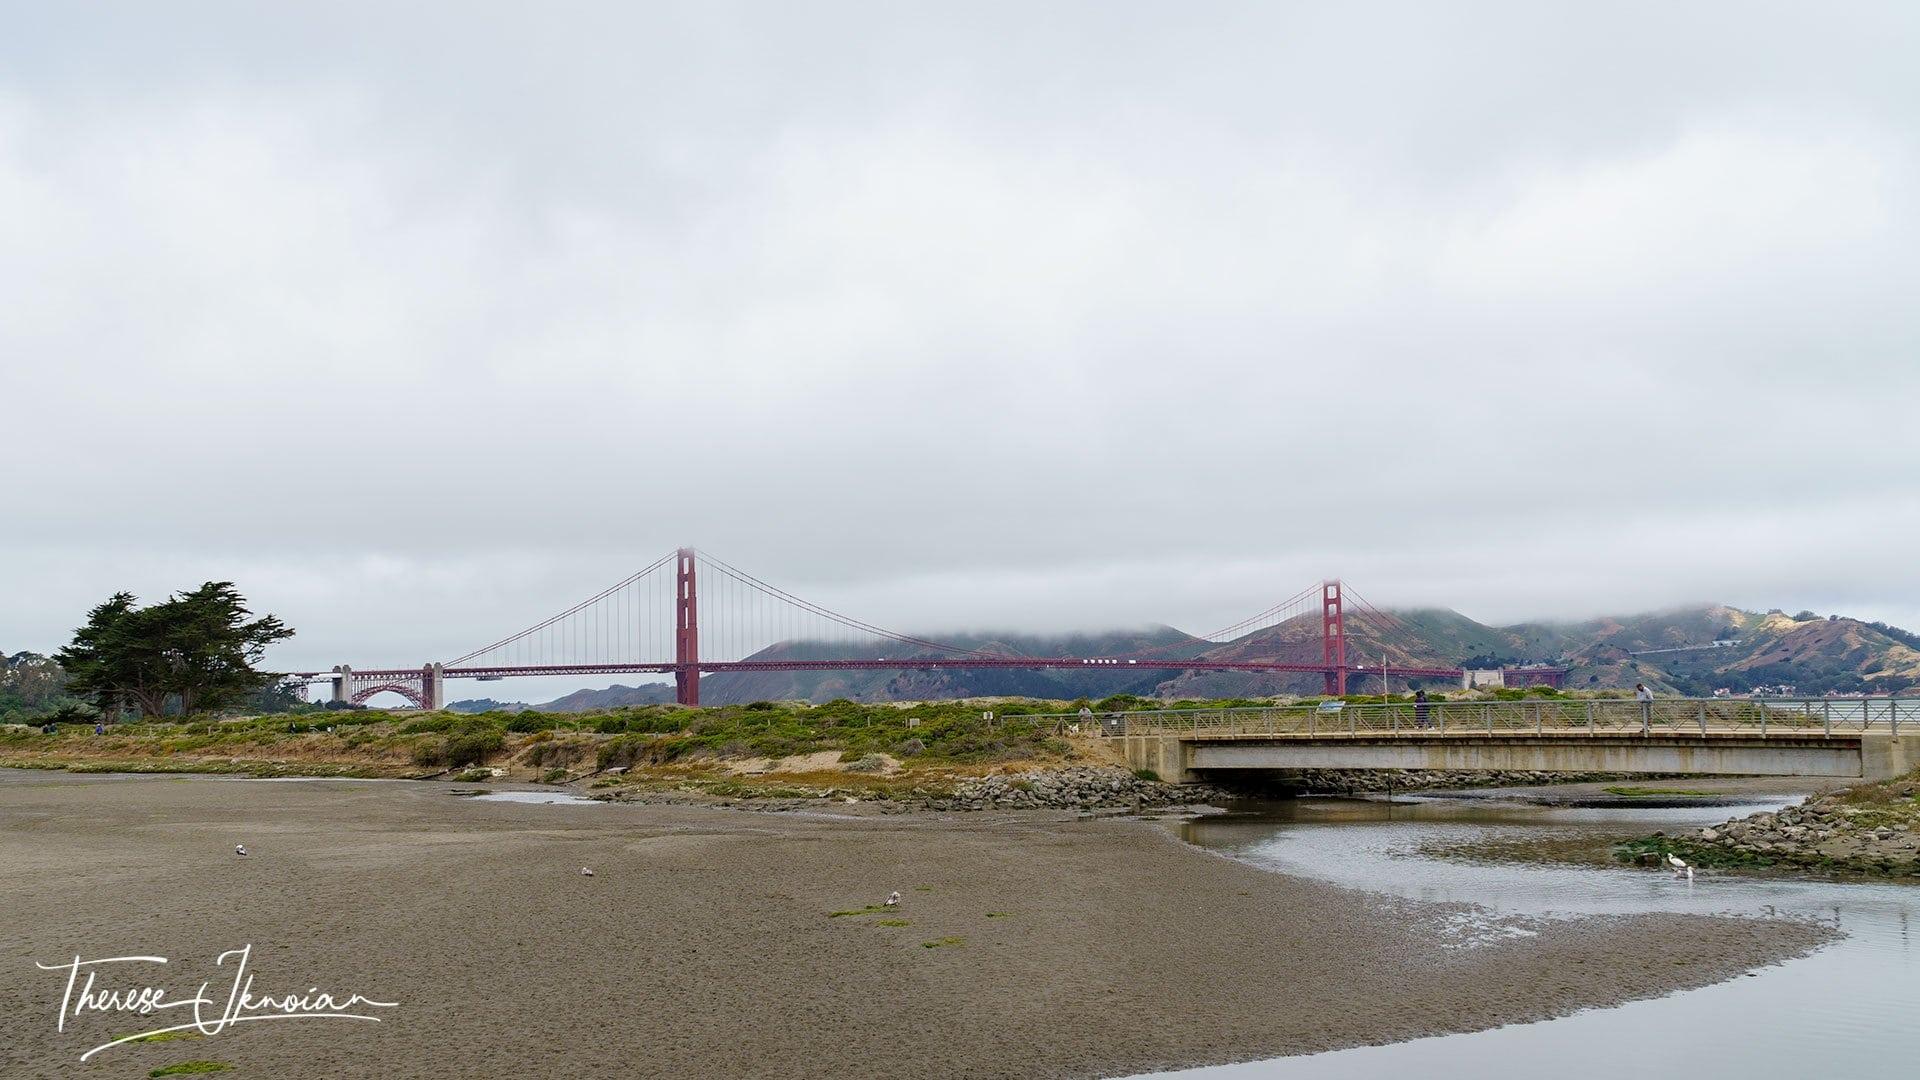 What to do in Presidio San Francisco - tidal marsh and Golden Gate Bridge views